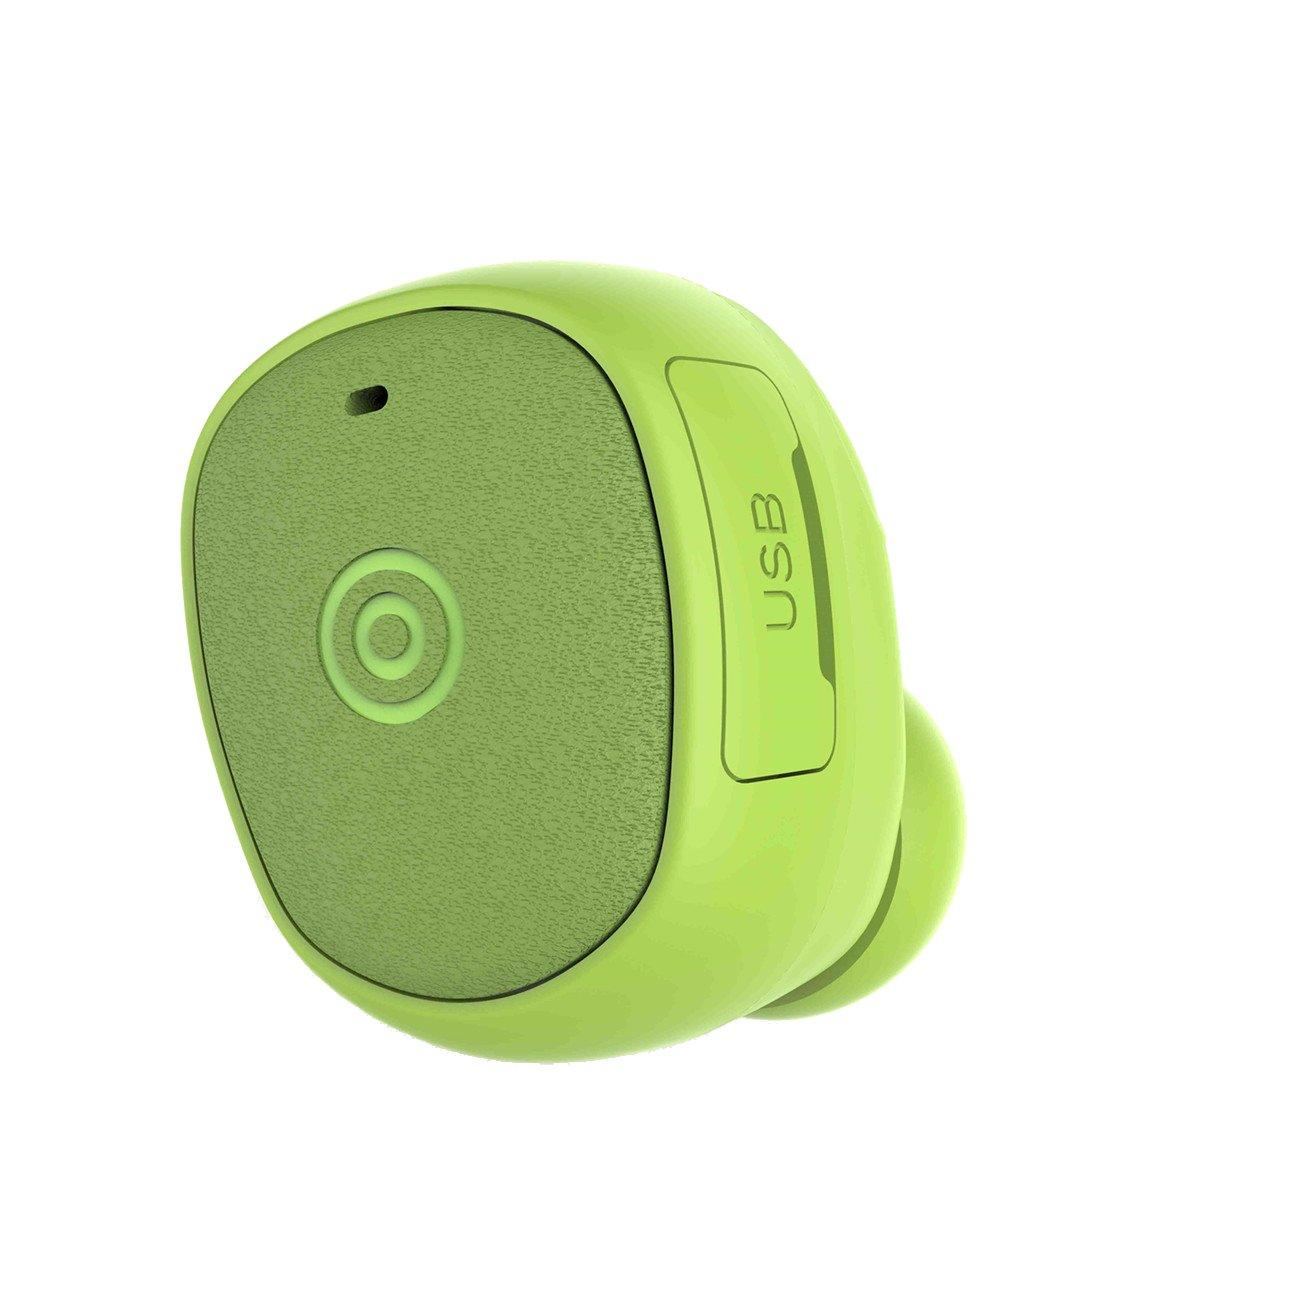 Green Wireless Mini Cell Phone Bluetooth Ear Piece